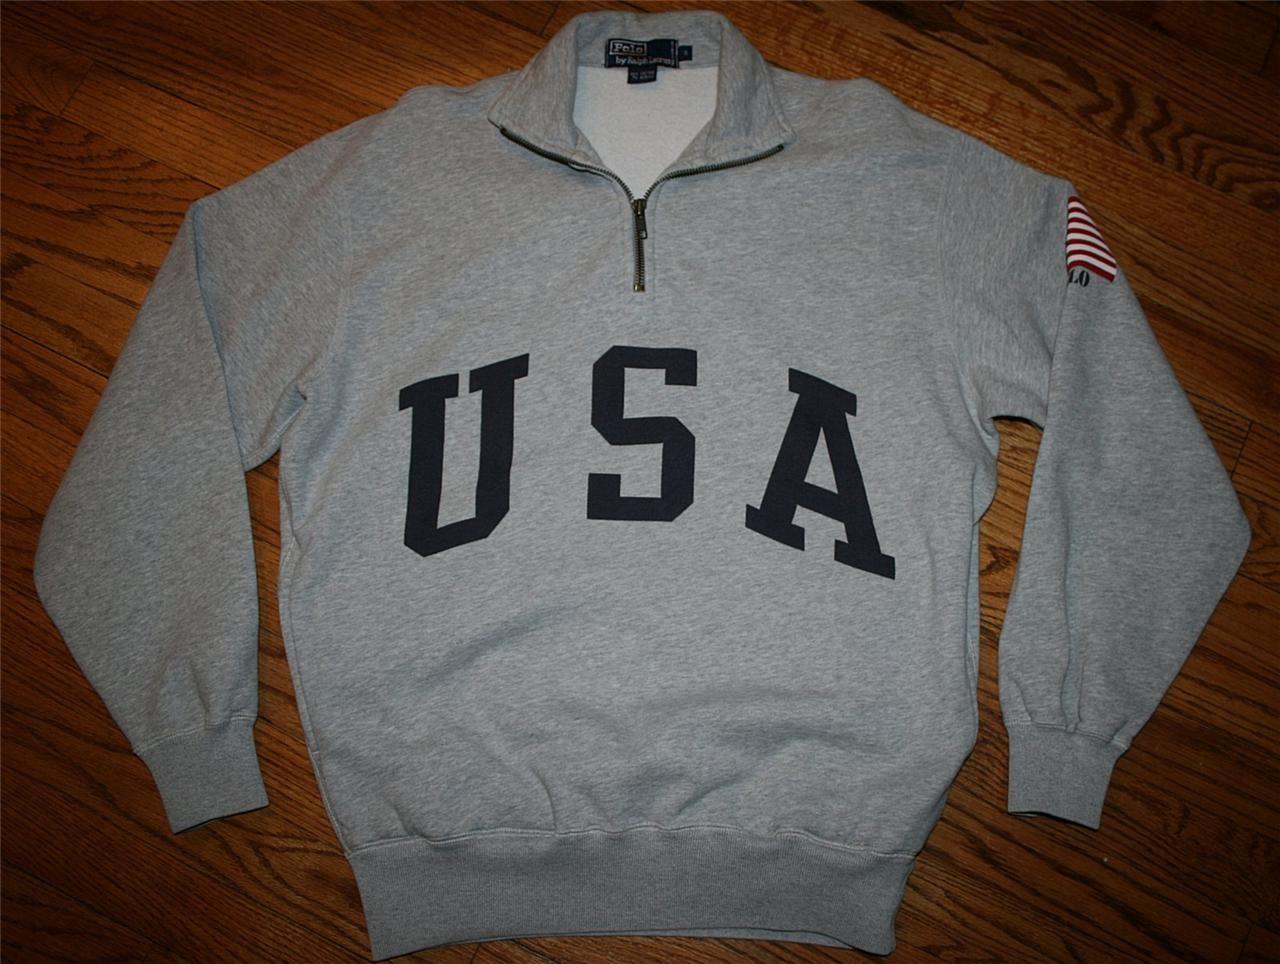 31efcbe98963 Polo Ralph Lauren USA Flag Half-Zip Pullover Sweatshirt-Small-Like  Nu-Negotiable